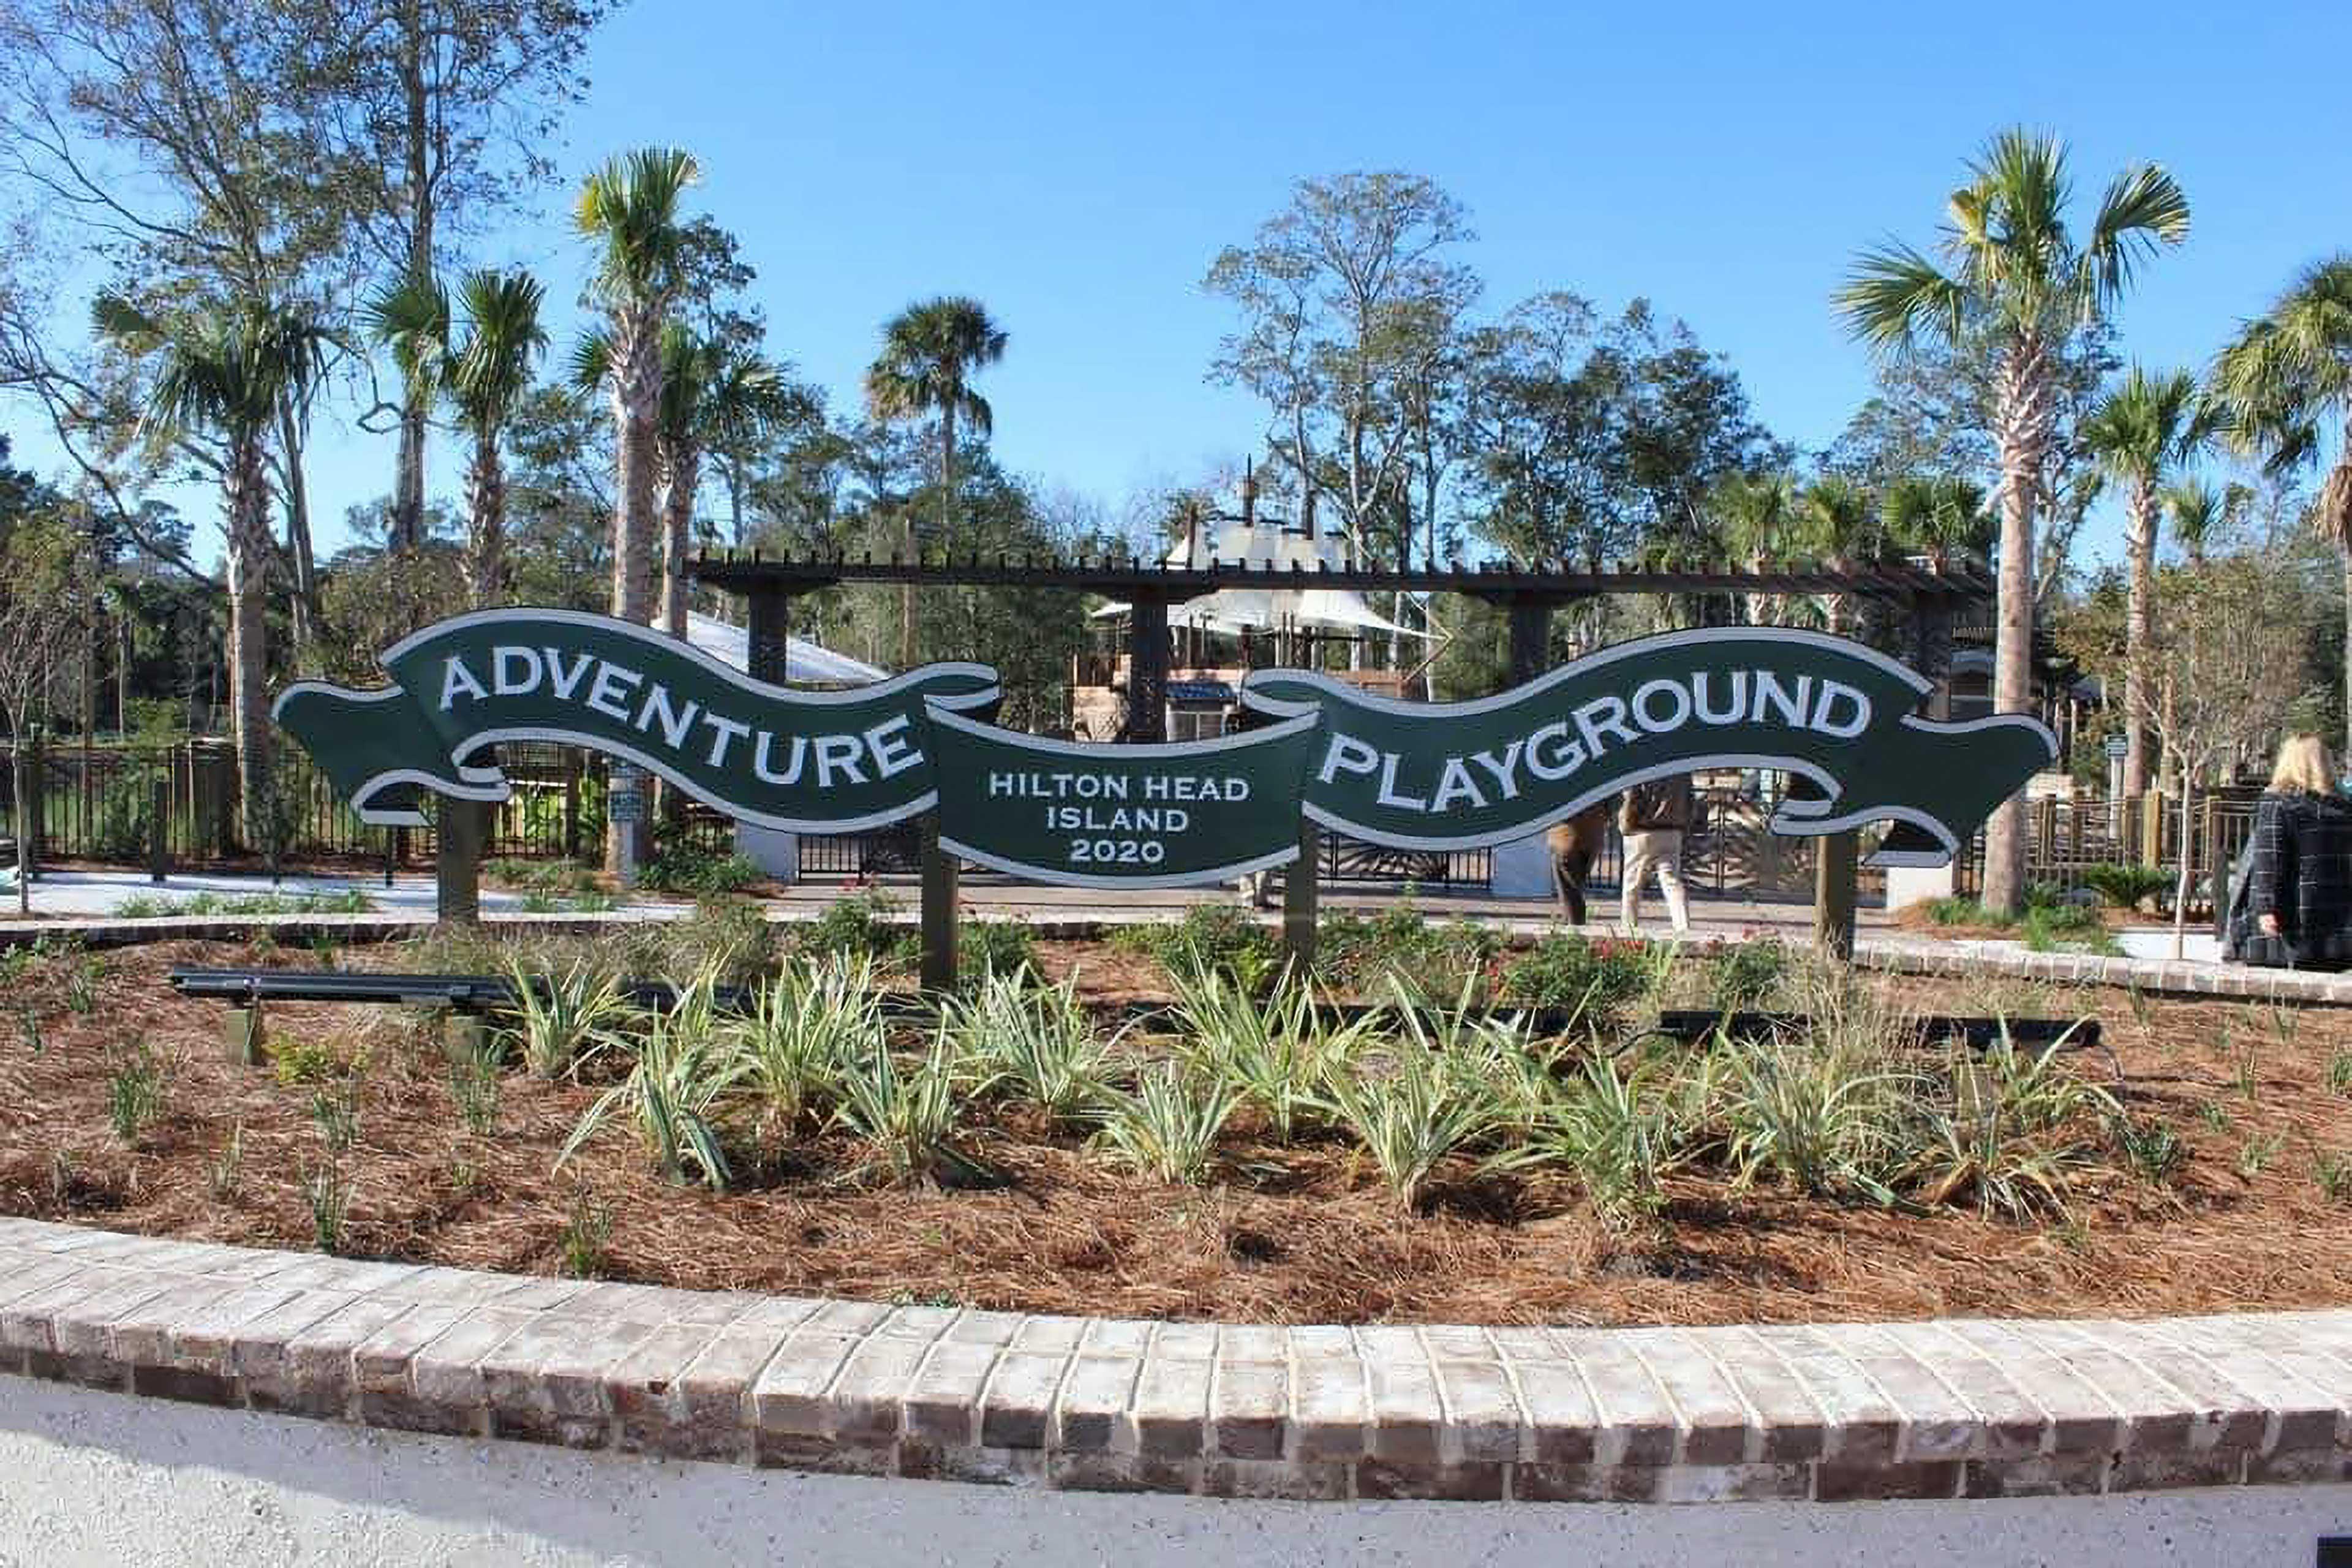 Adventure Playground   2 Blocks Away